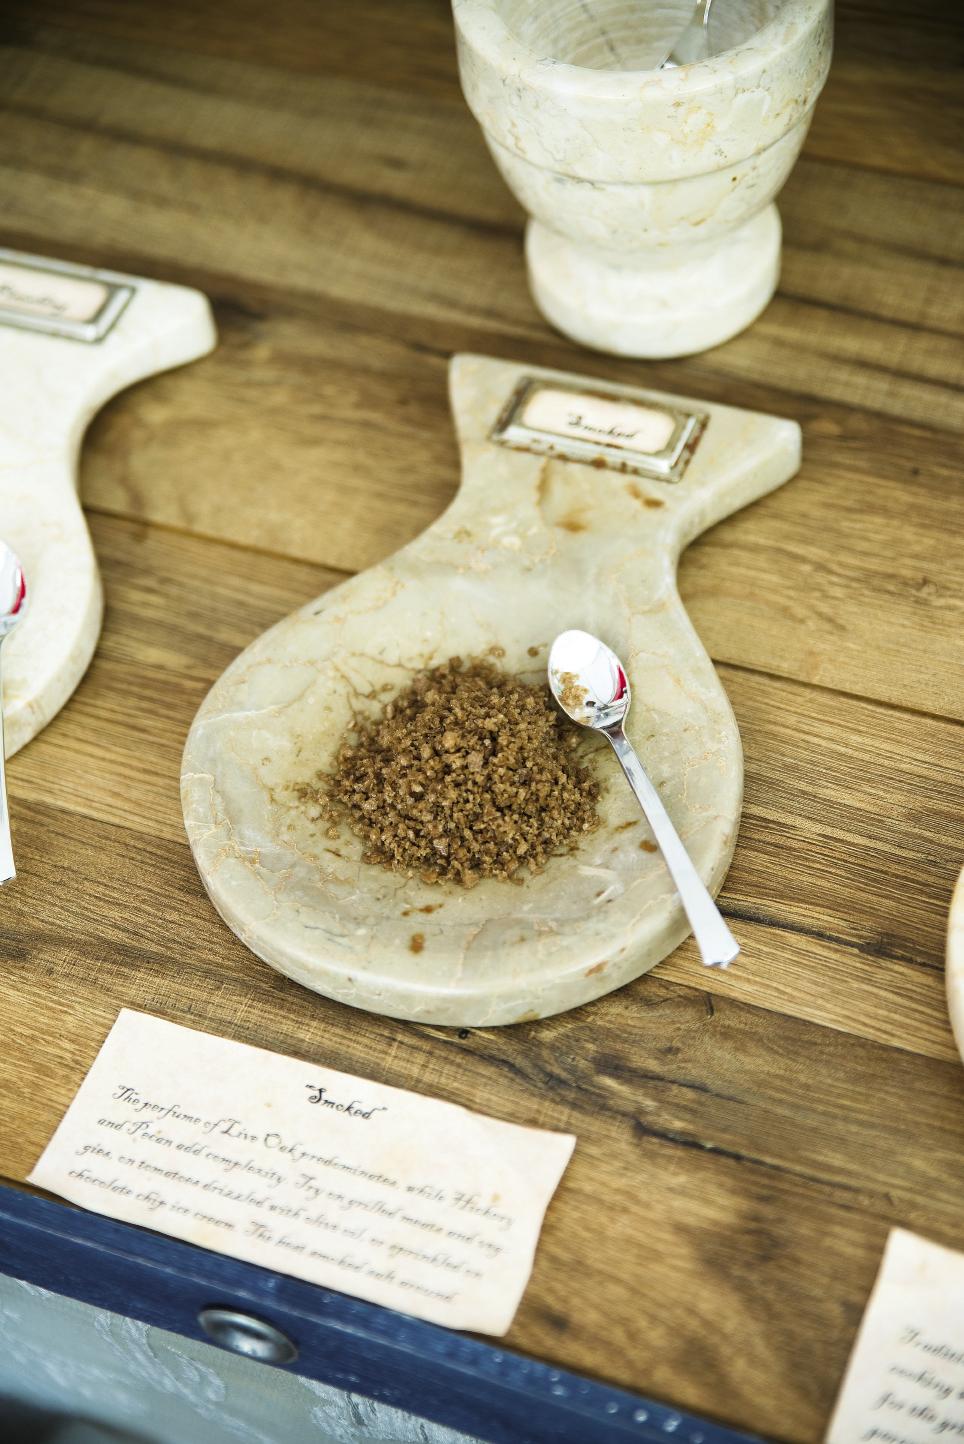 Samples of Botany Bay Sea Salt.